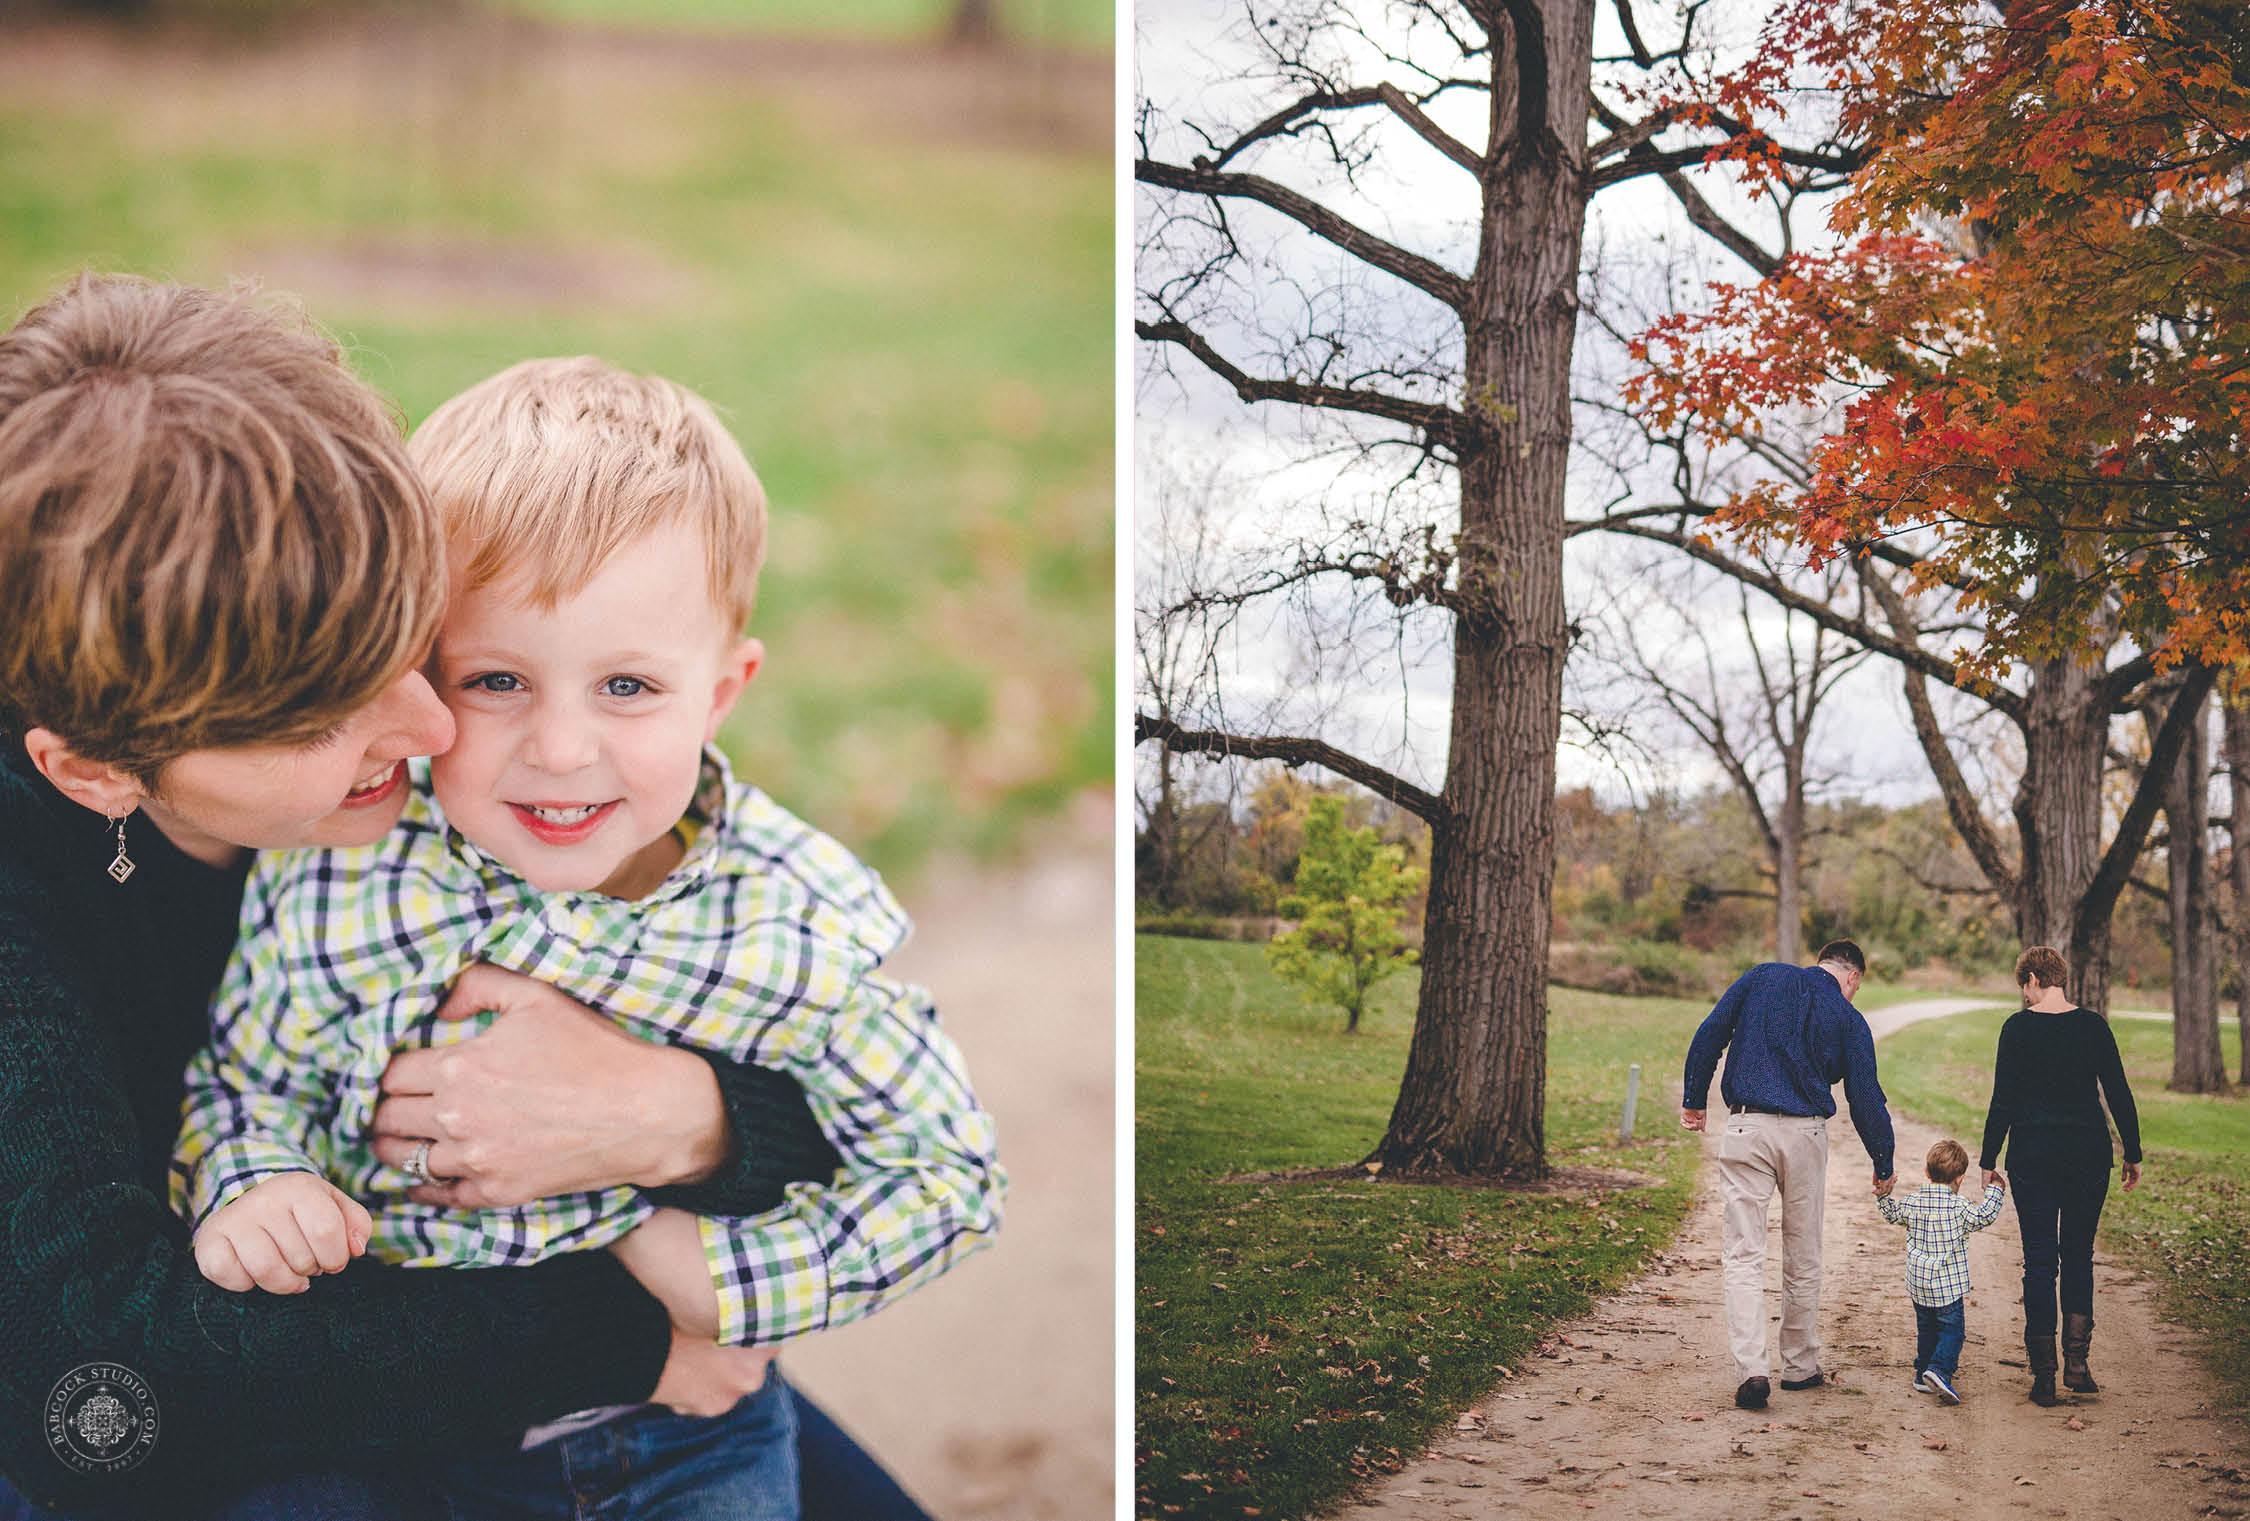 meyer-famly-children-photographer-dayton-ohio-7.jpg